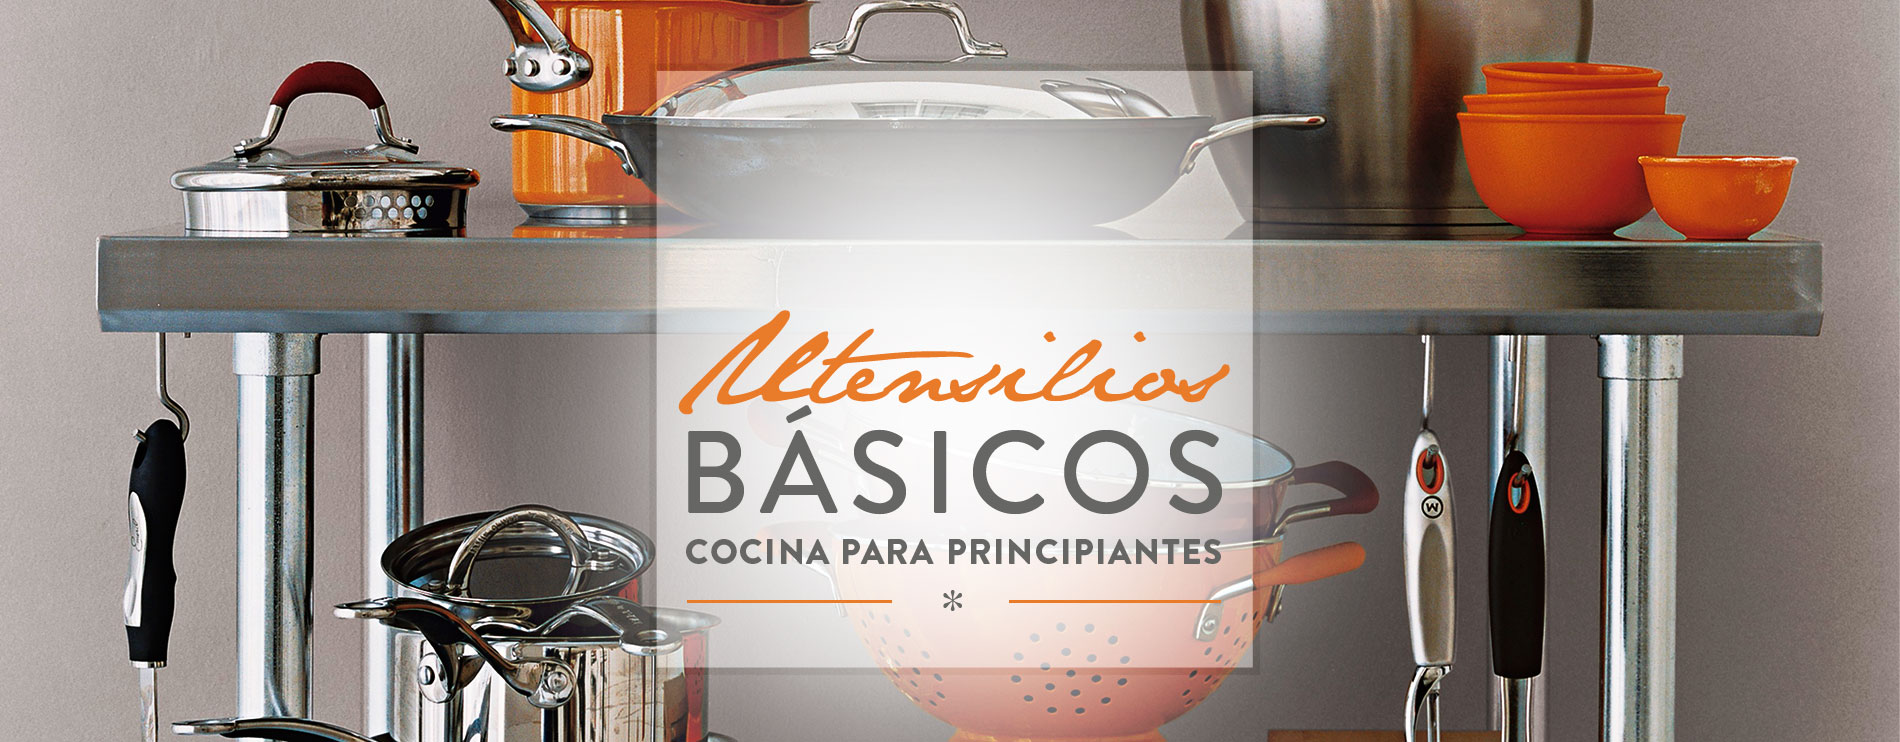 Cocina para principiantes utensilios b sicos westwing - Cocina para principiantes ...